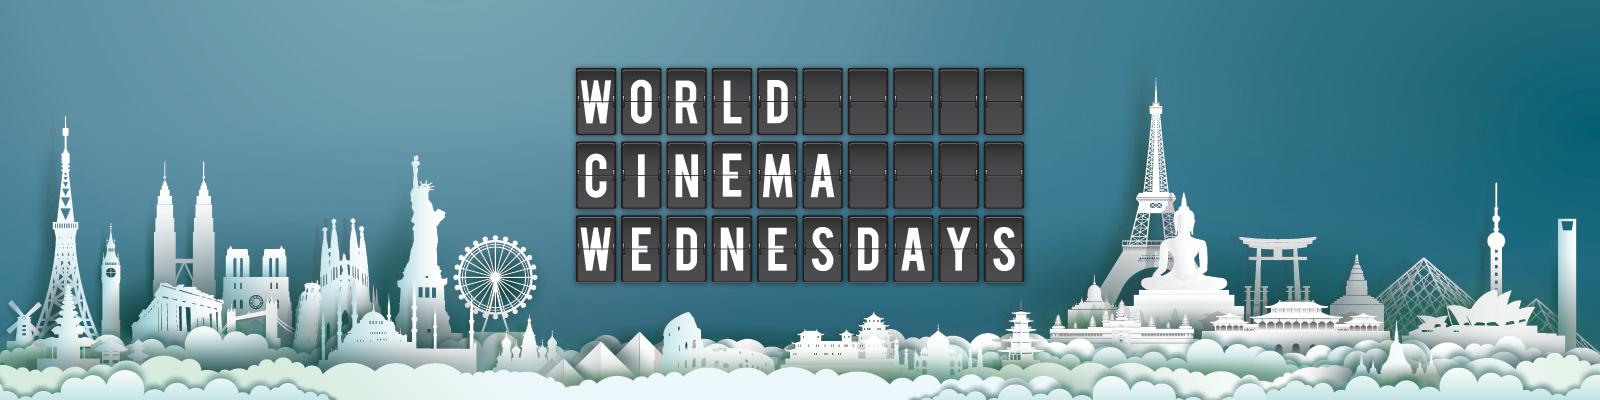 World Cinema Wednesdays